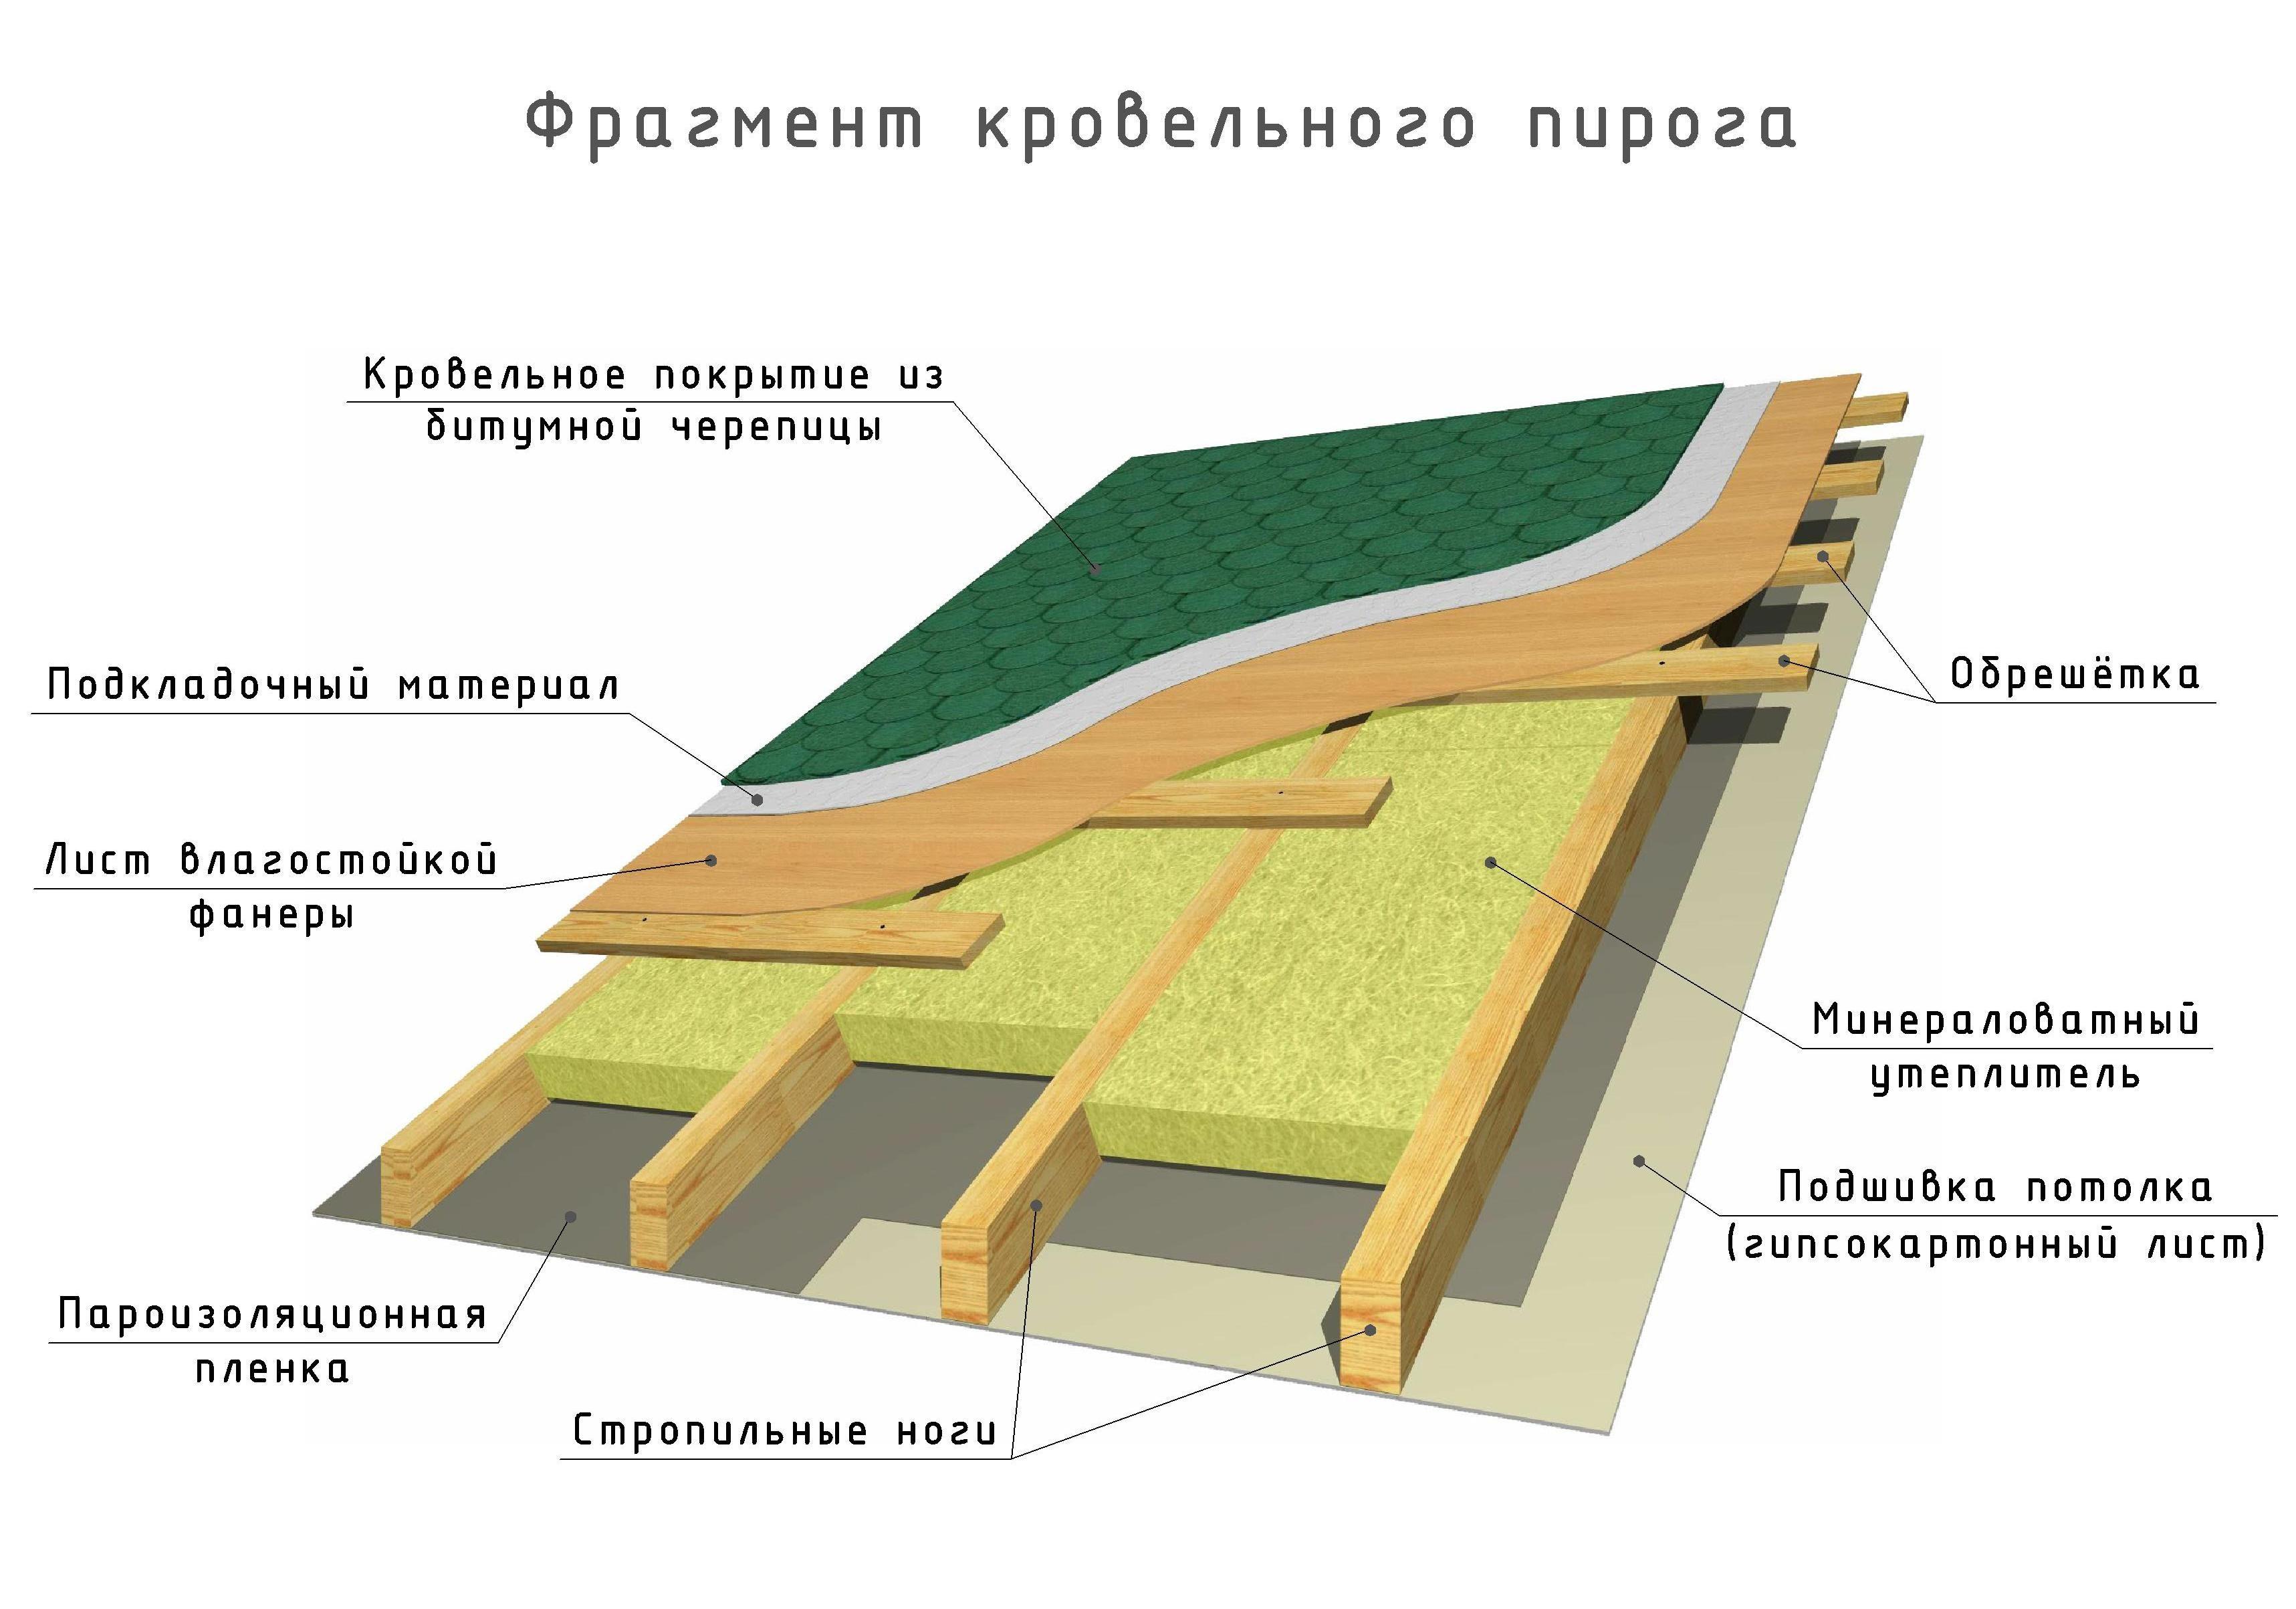 Правильная односкатная крыша